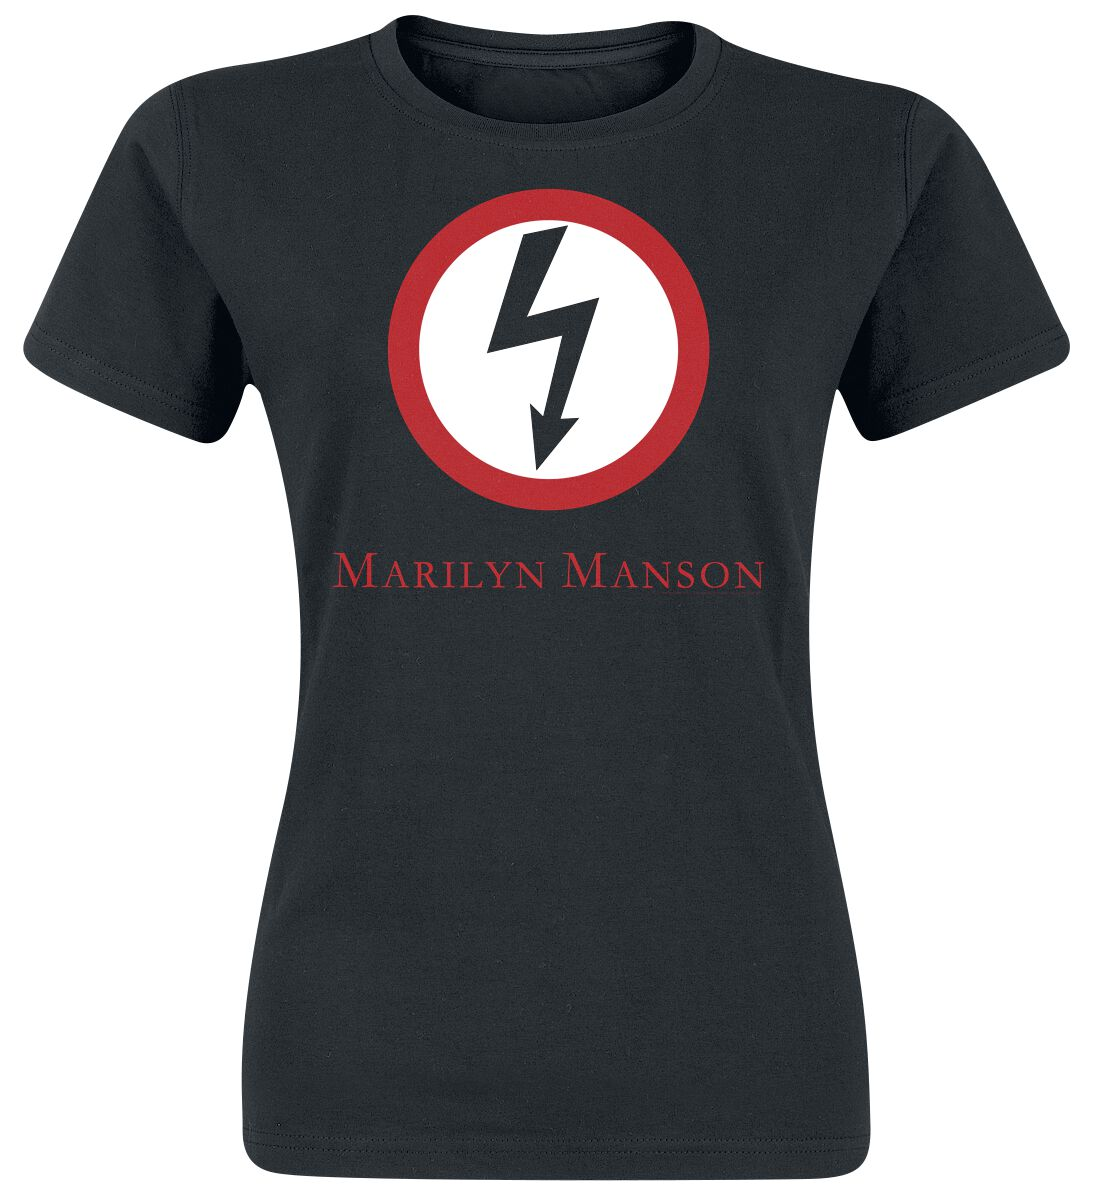 Zespoły - Koszulki - Koszulka damska Marilyn Manson Classic Bolt Koszulka damska czarny - 368097